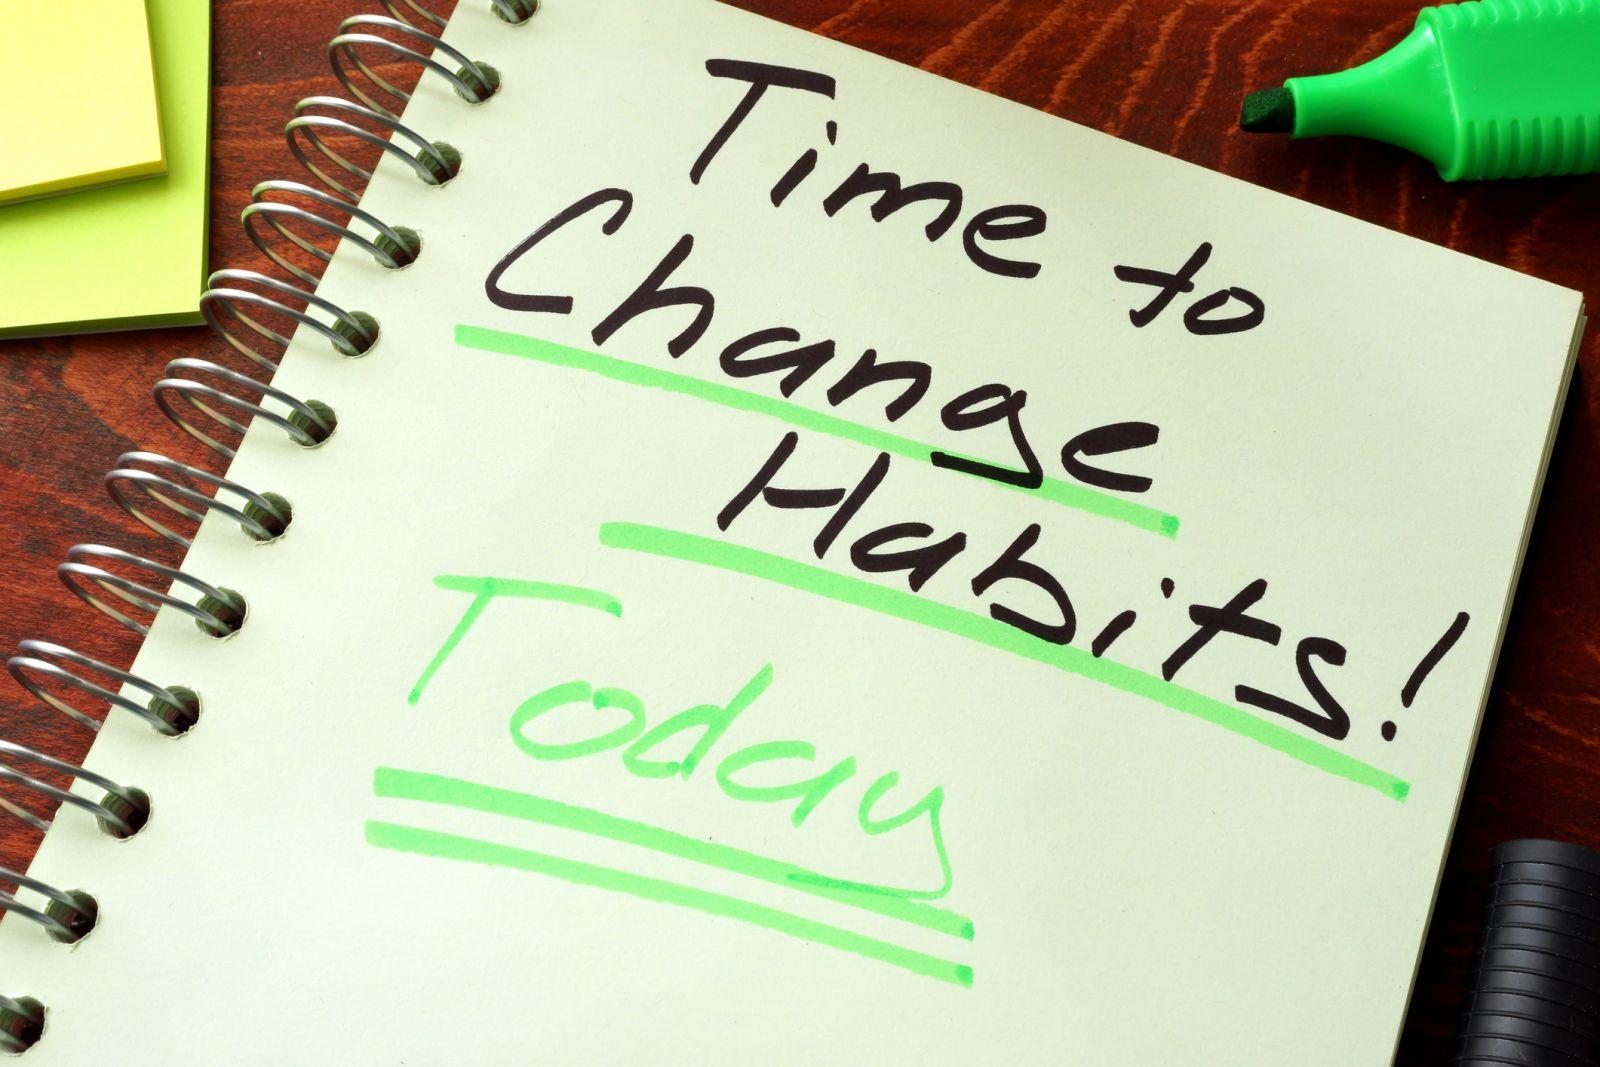 Why Behavior Change Is Hard